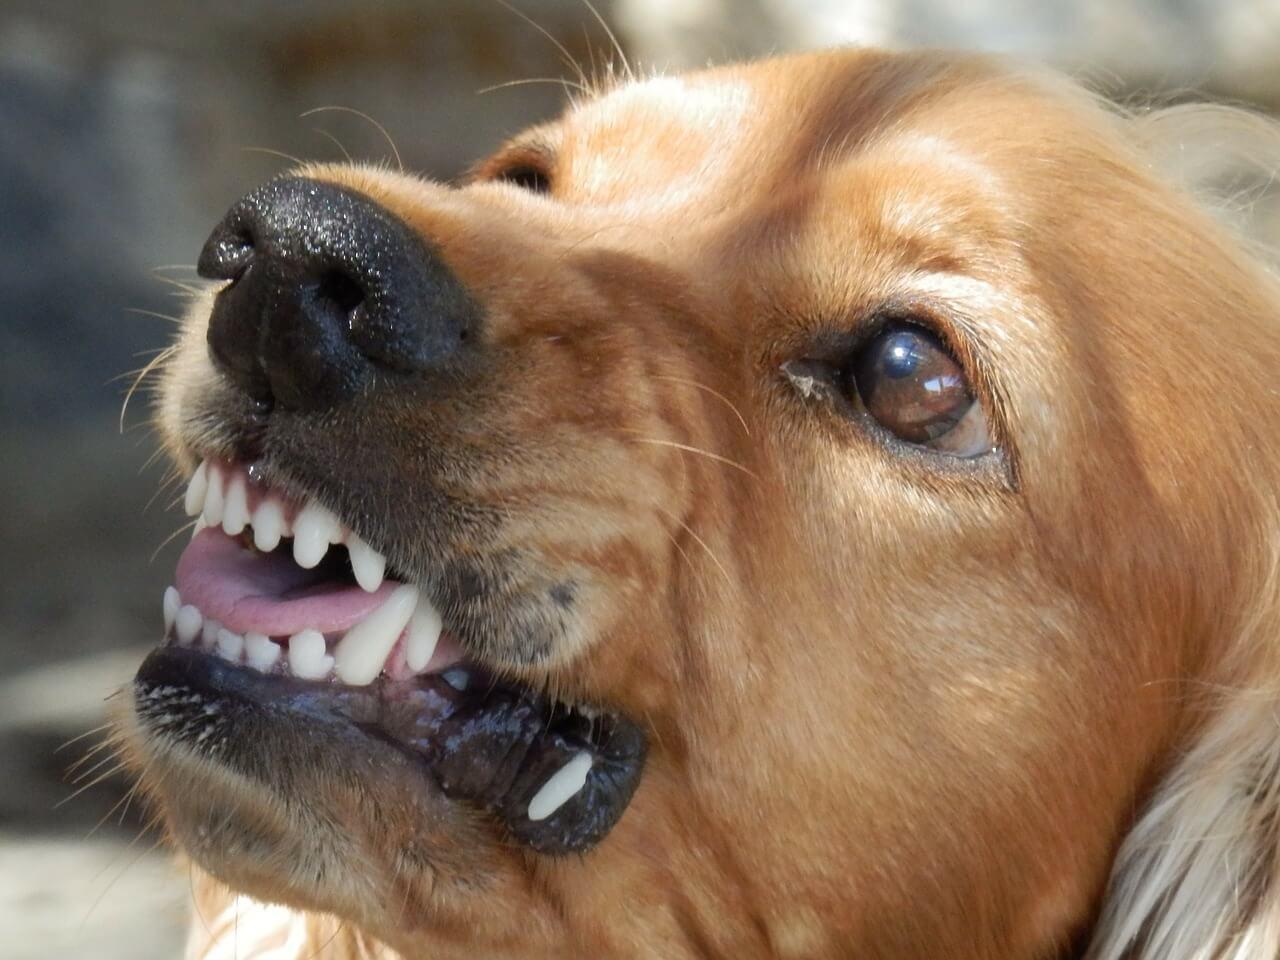 Dog Bite Injury Case Weighed Pt. 2